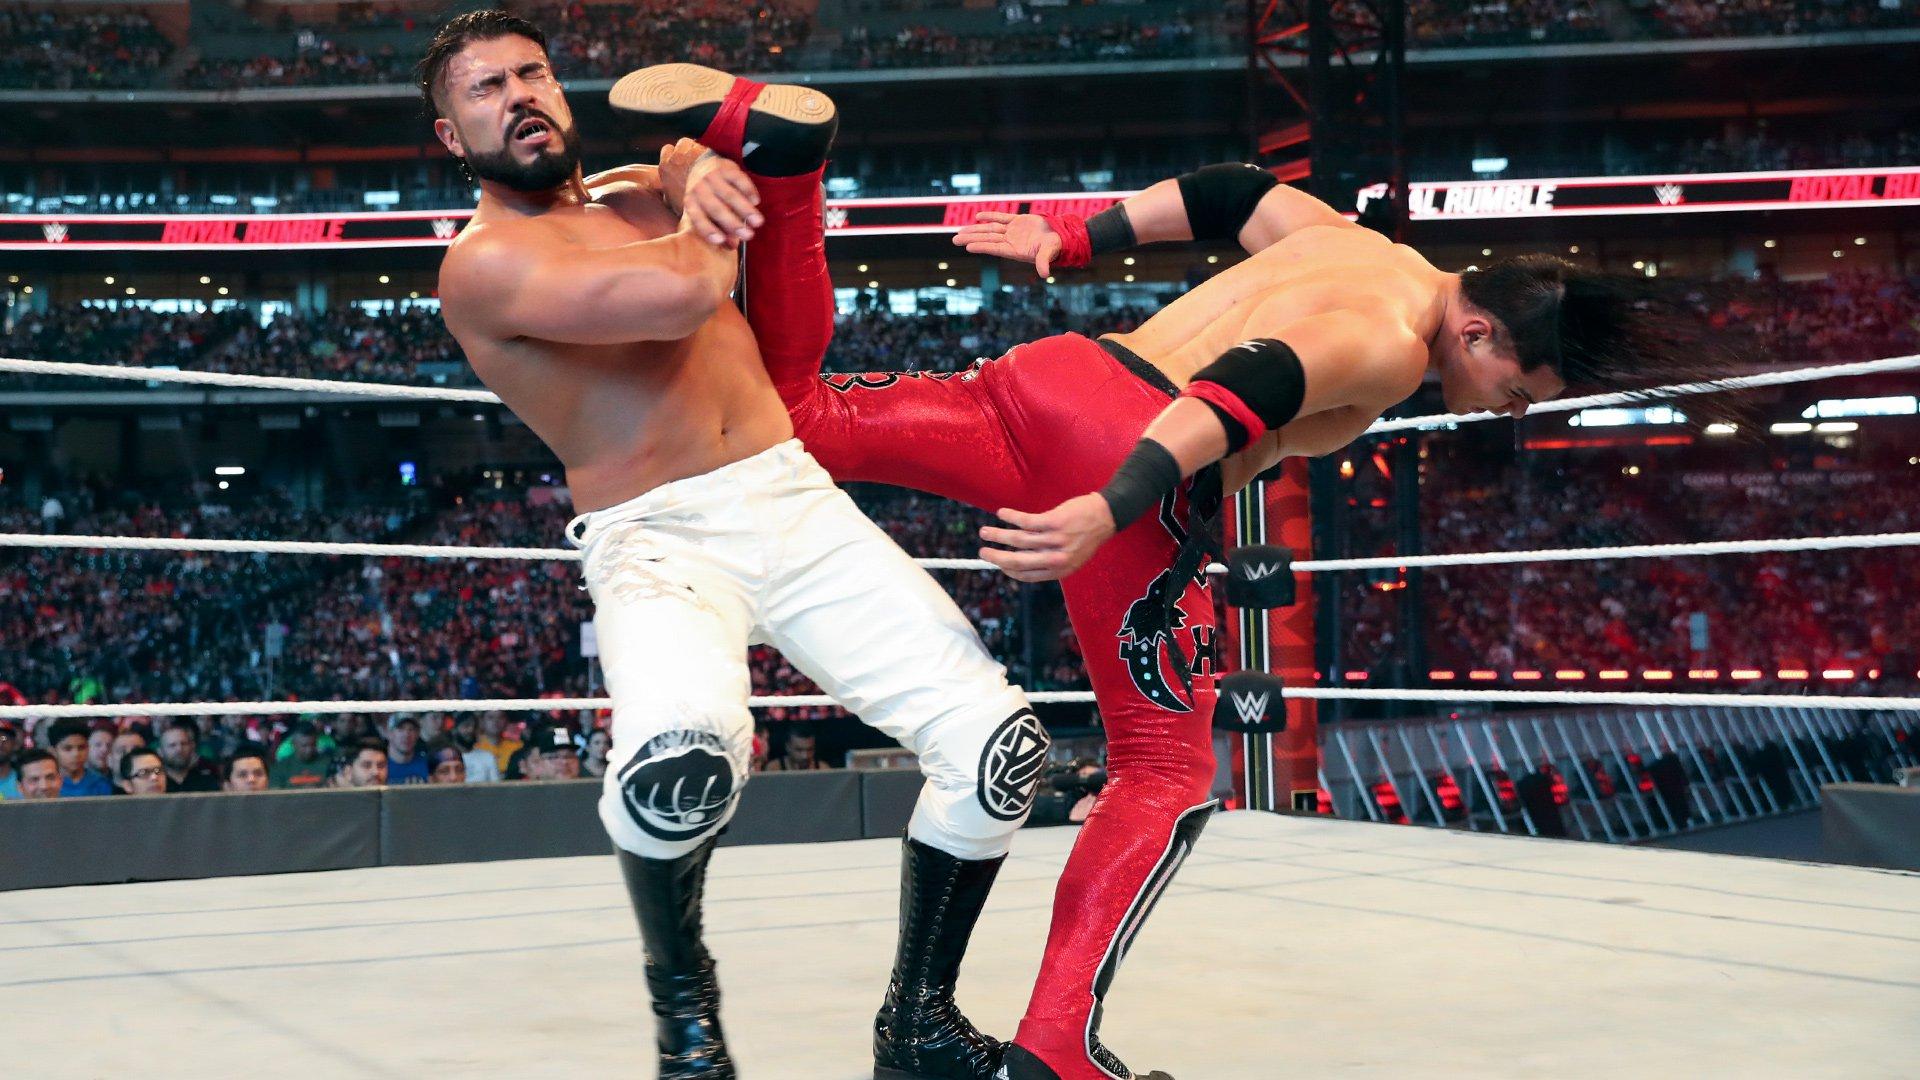 Andrade retém o WWE United States Championship no Royal Rumble